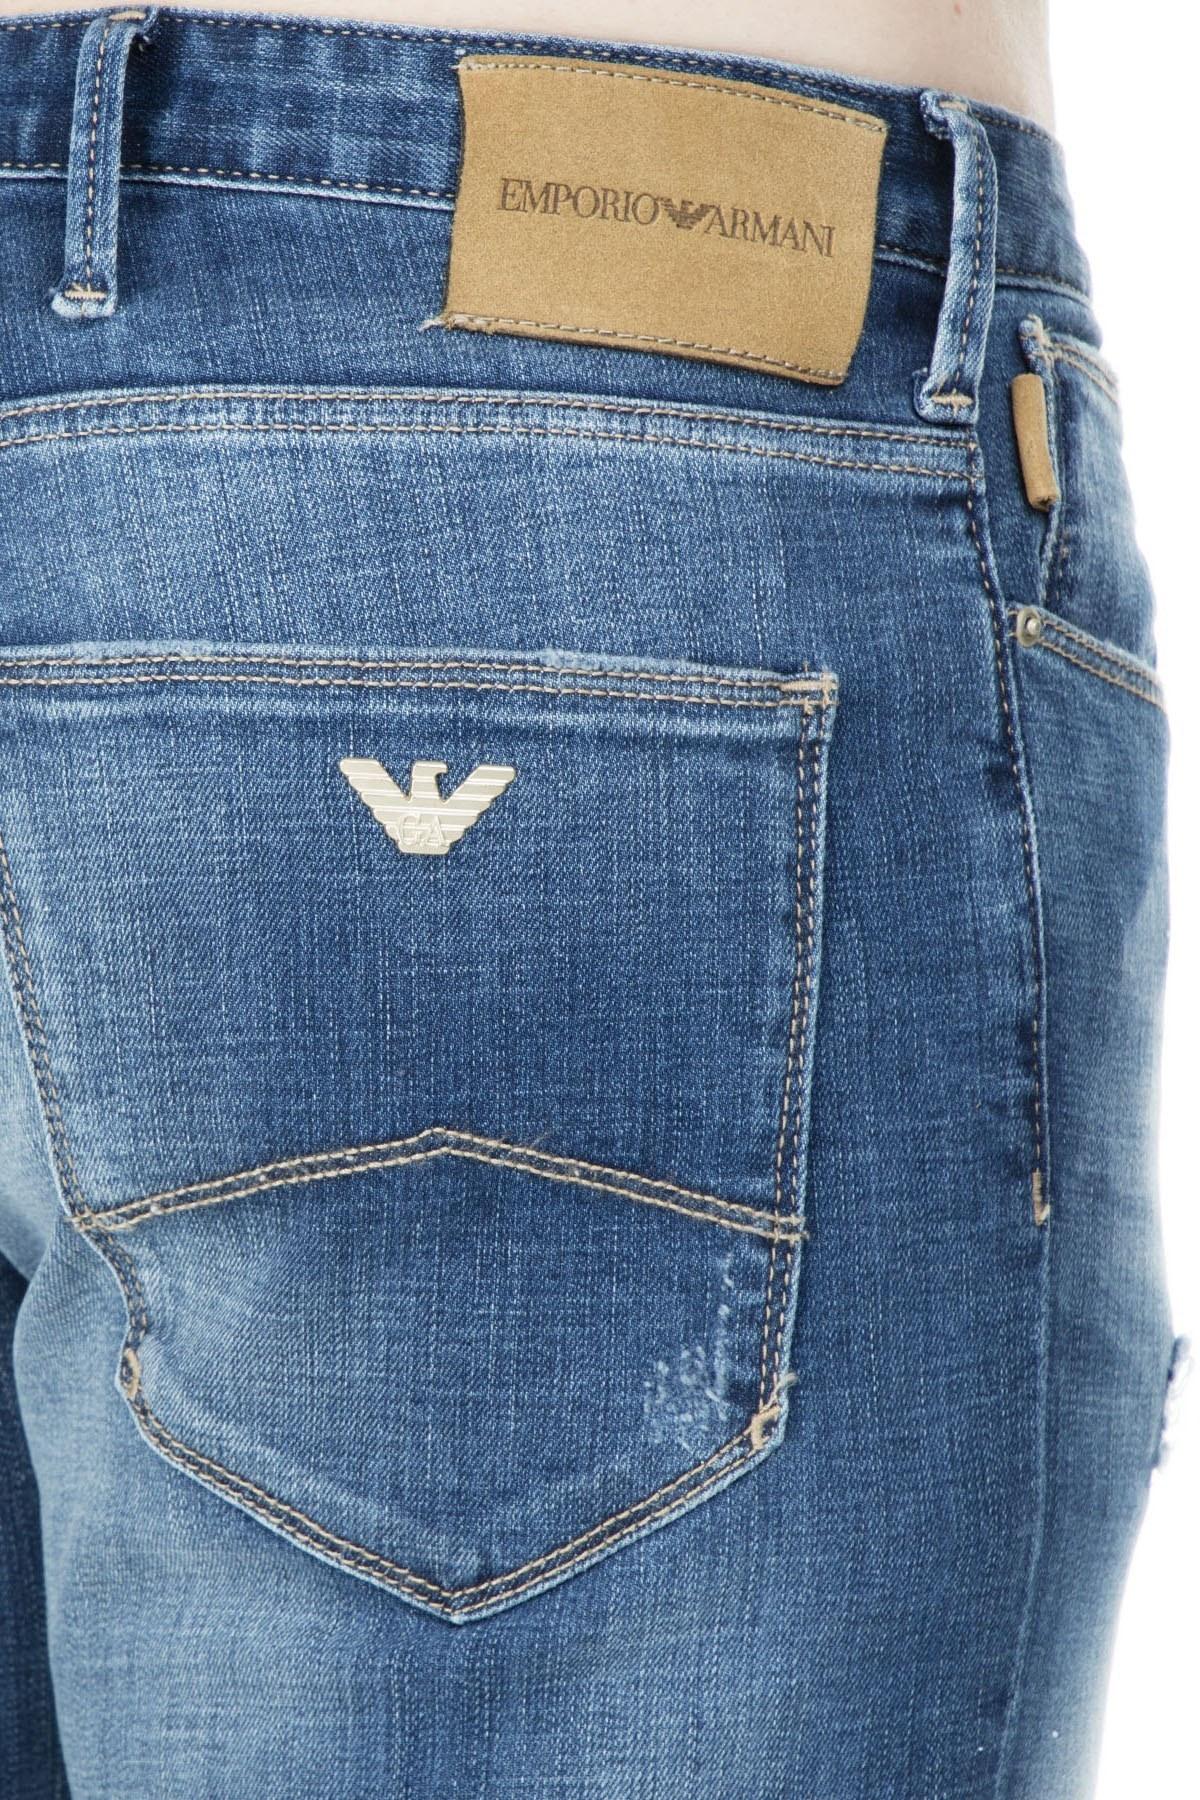 Emporio Armani J06 Jeans Erkek Kot Pantolon S 3G1J06 1D5MZ 941 LACİVERT